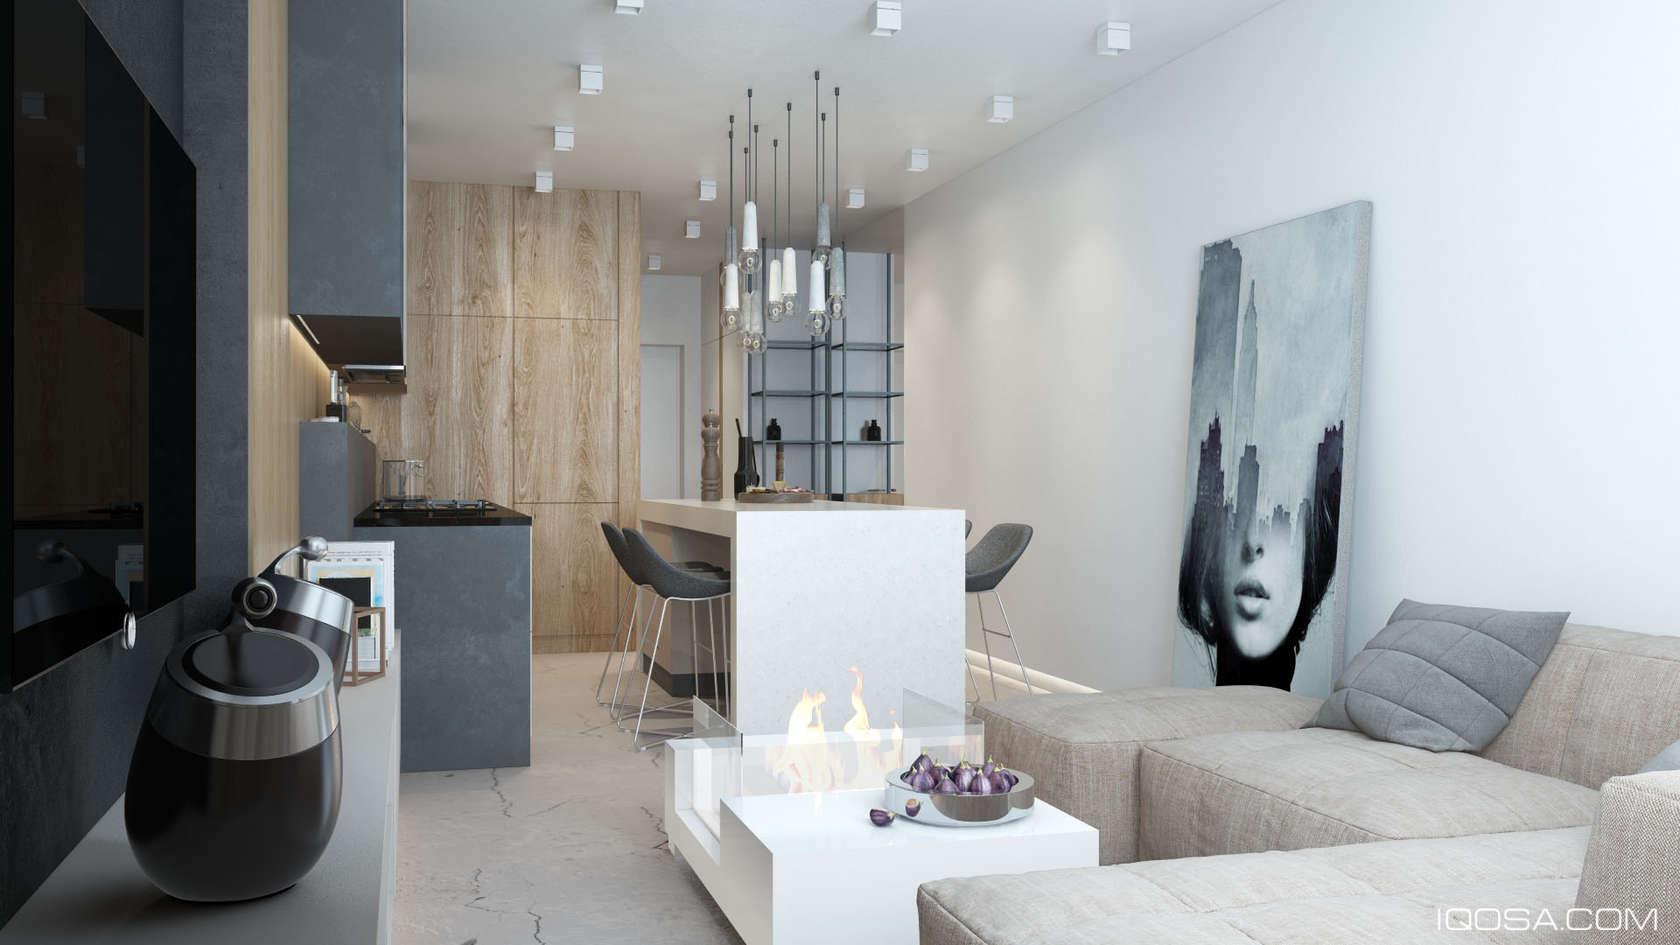 Fullsize Of Small Apartment Design Tips